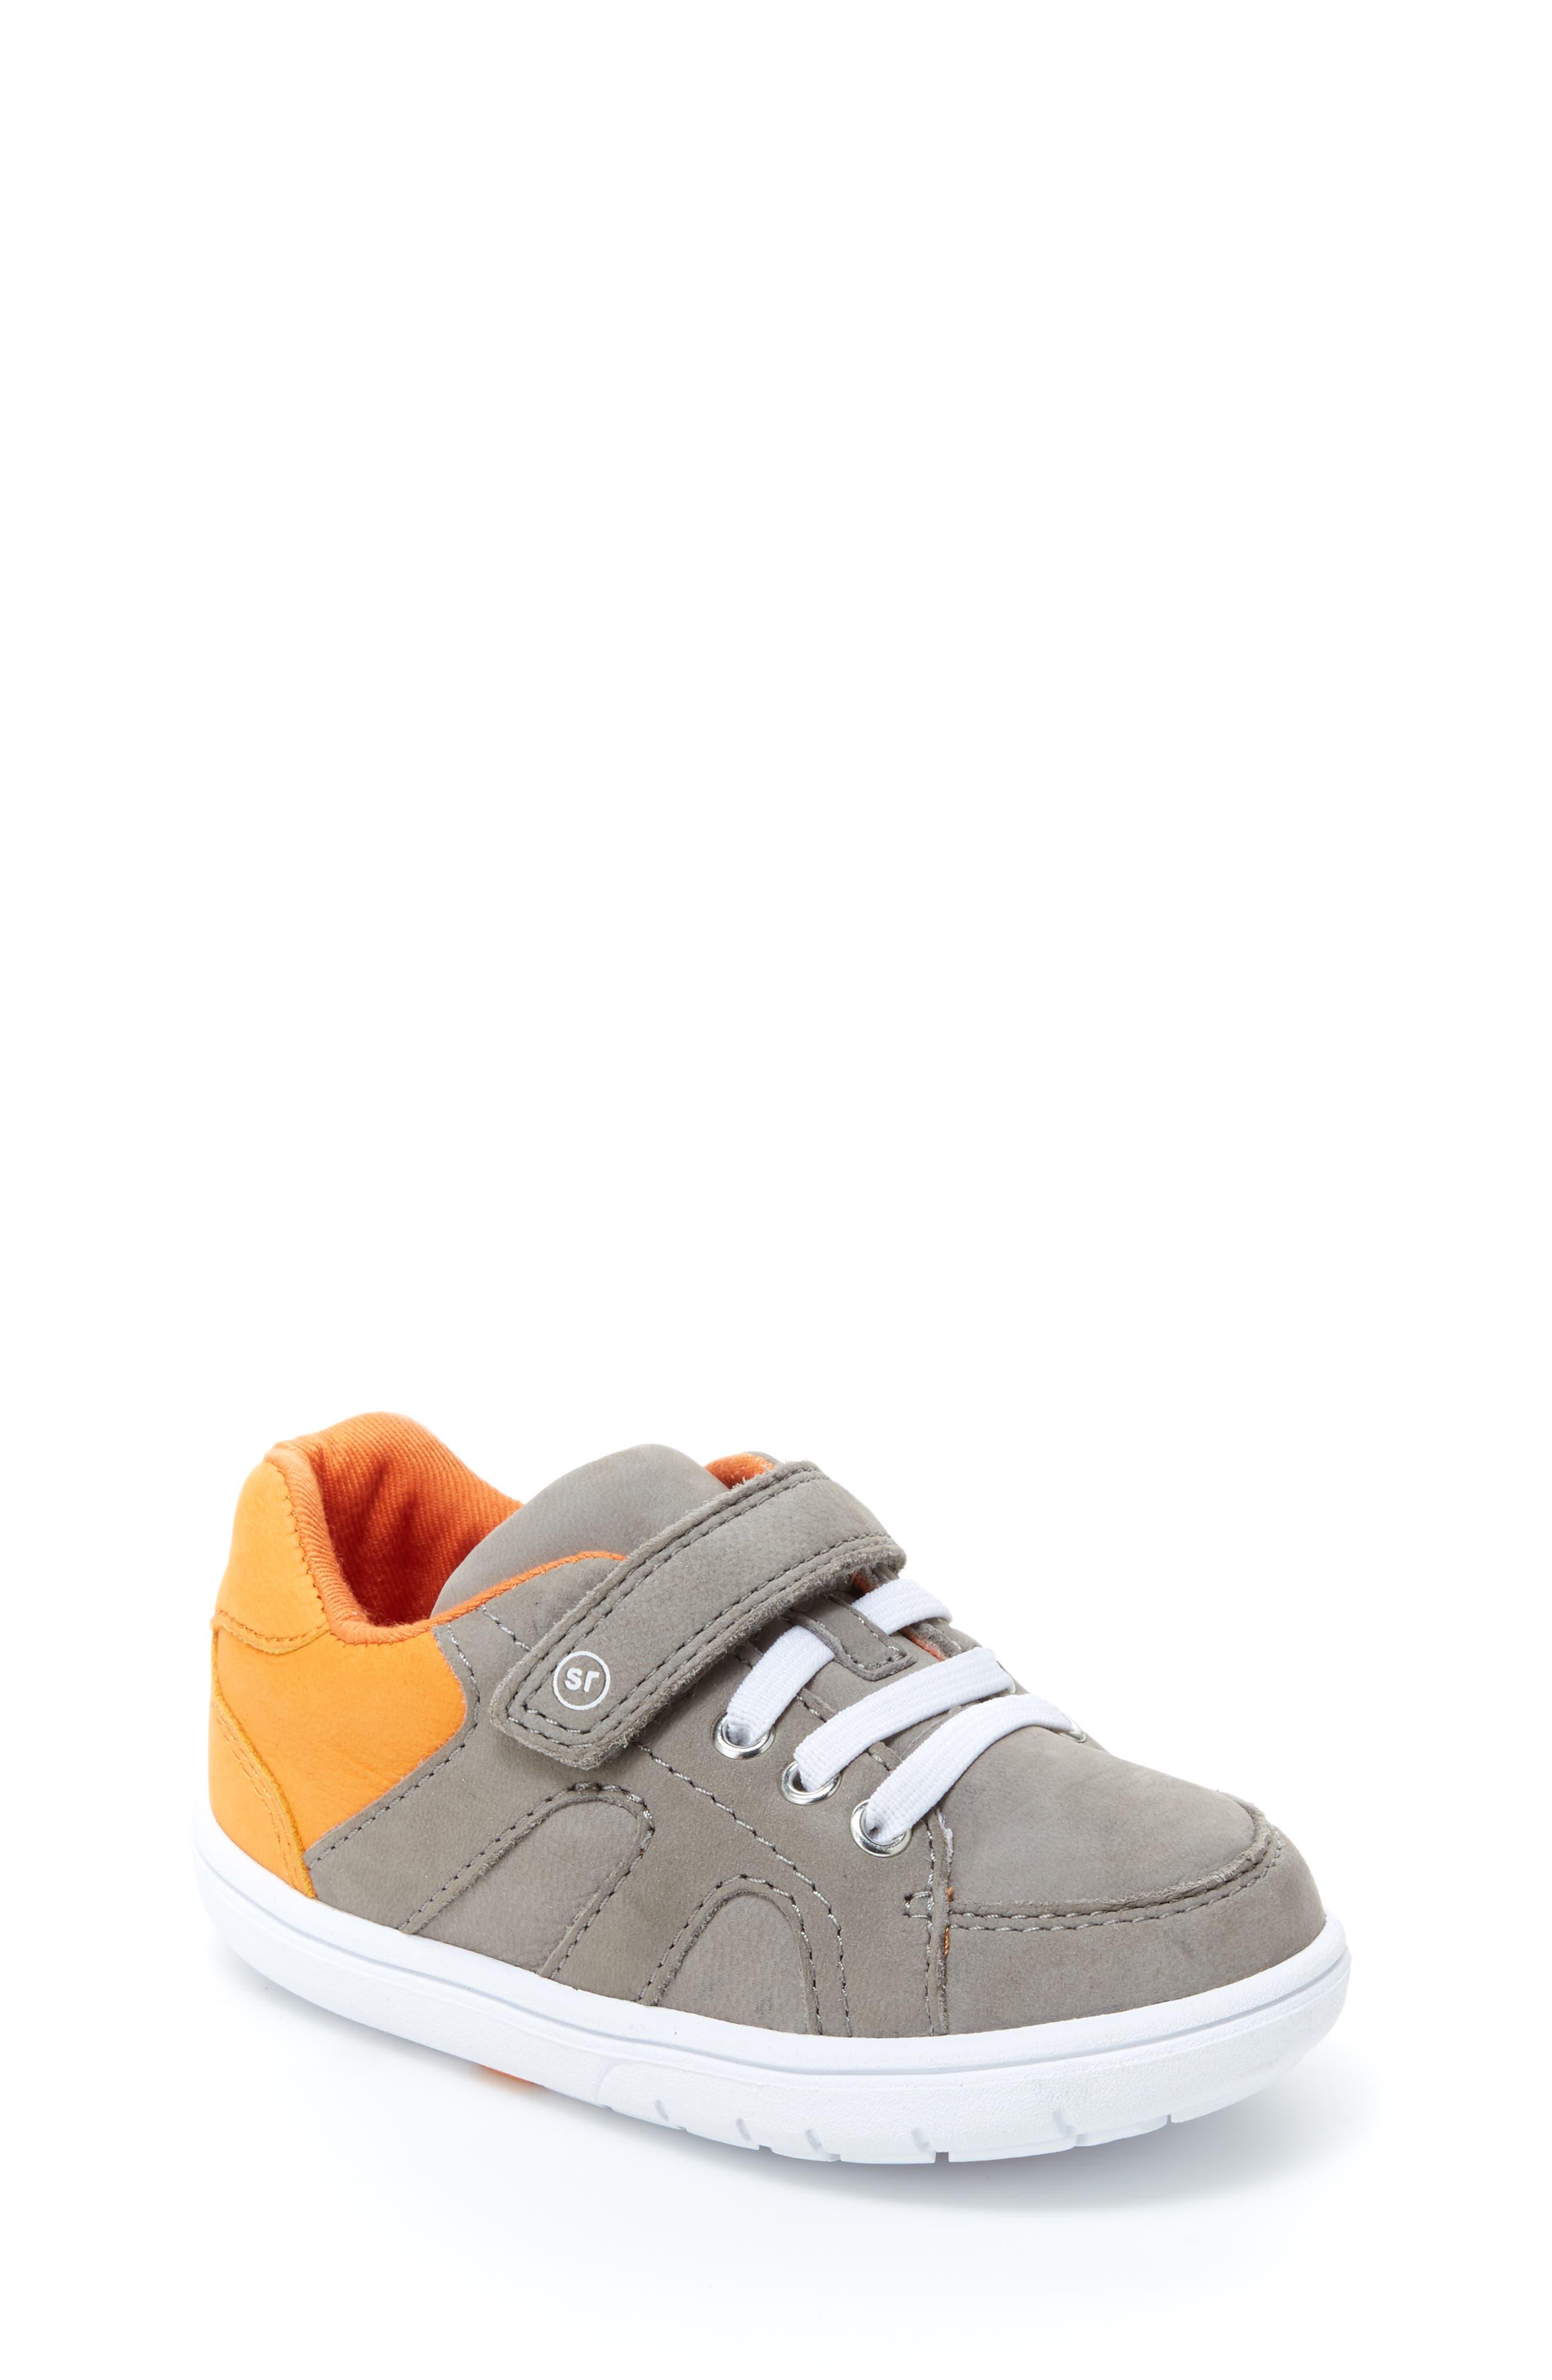 SRT Noe Sneaker,                             Main thumbnail 1, color,                             Grey/ Orange